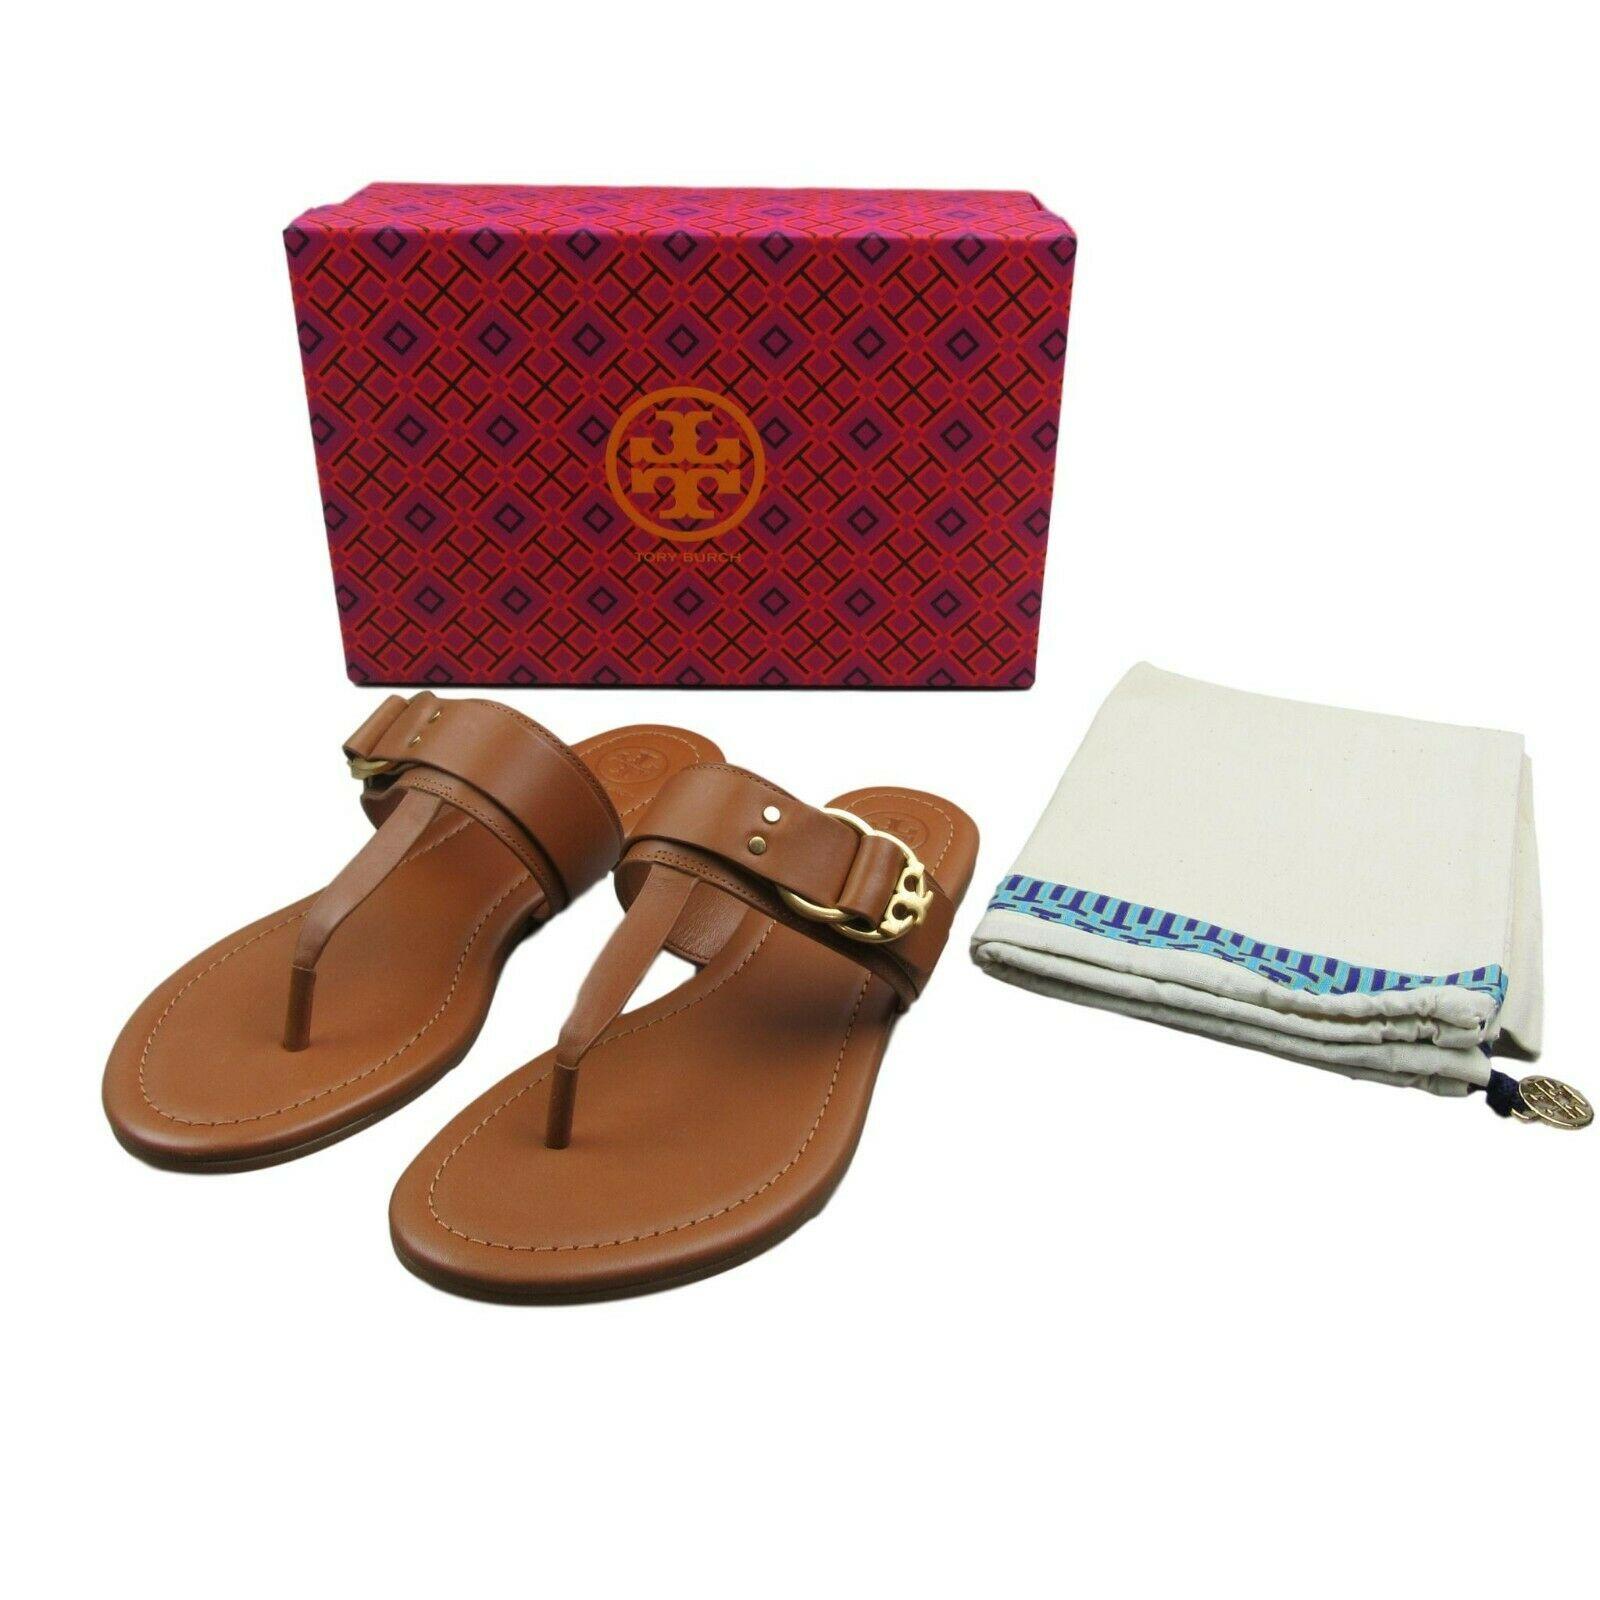 4d32db48ed1f Tory Burch Marsden Flat Thong Sandal Size 8 Tan Leather  49357 New  228